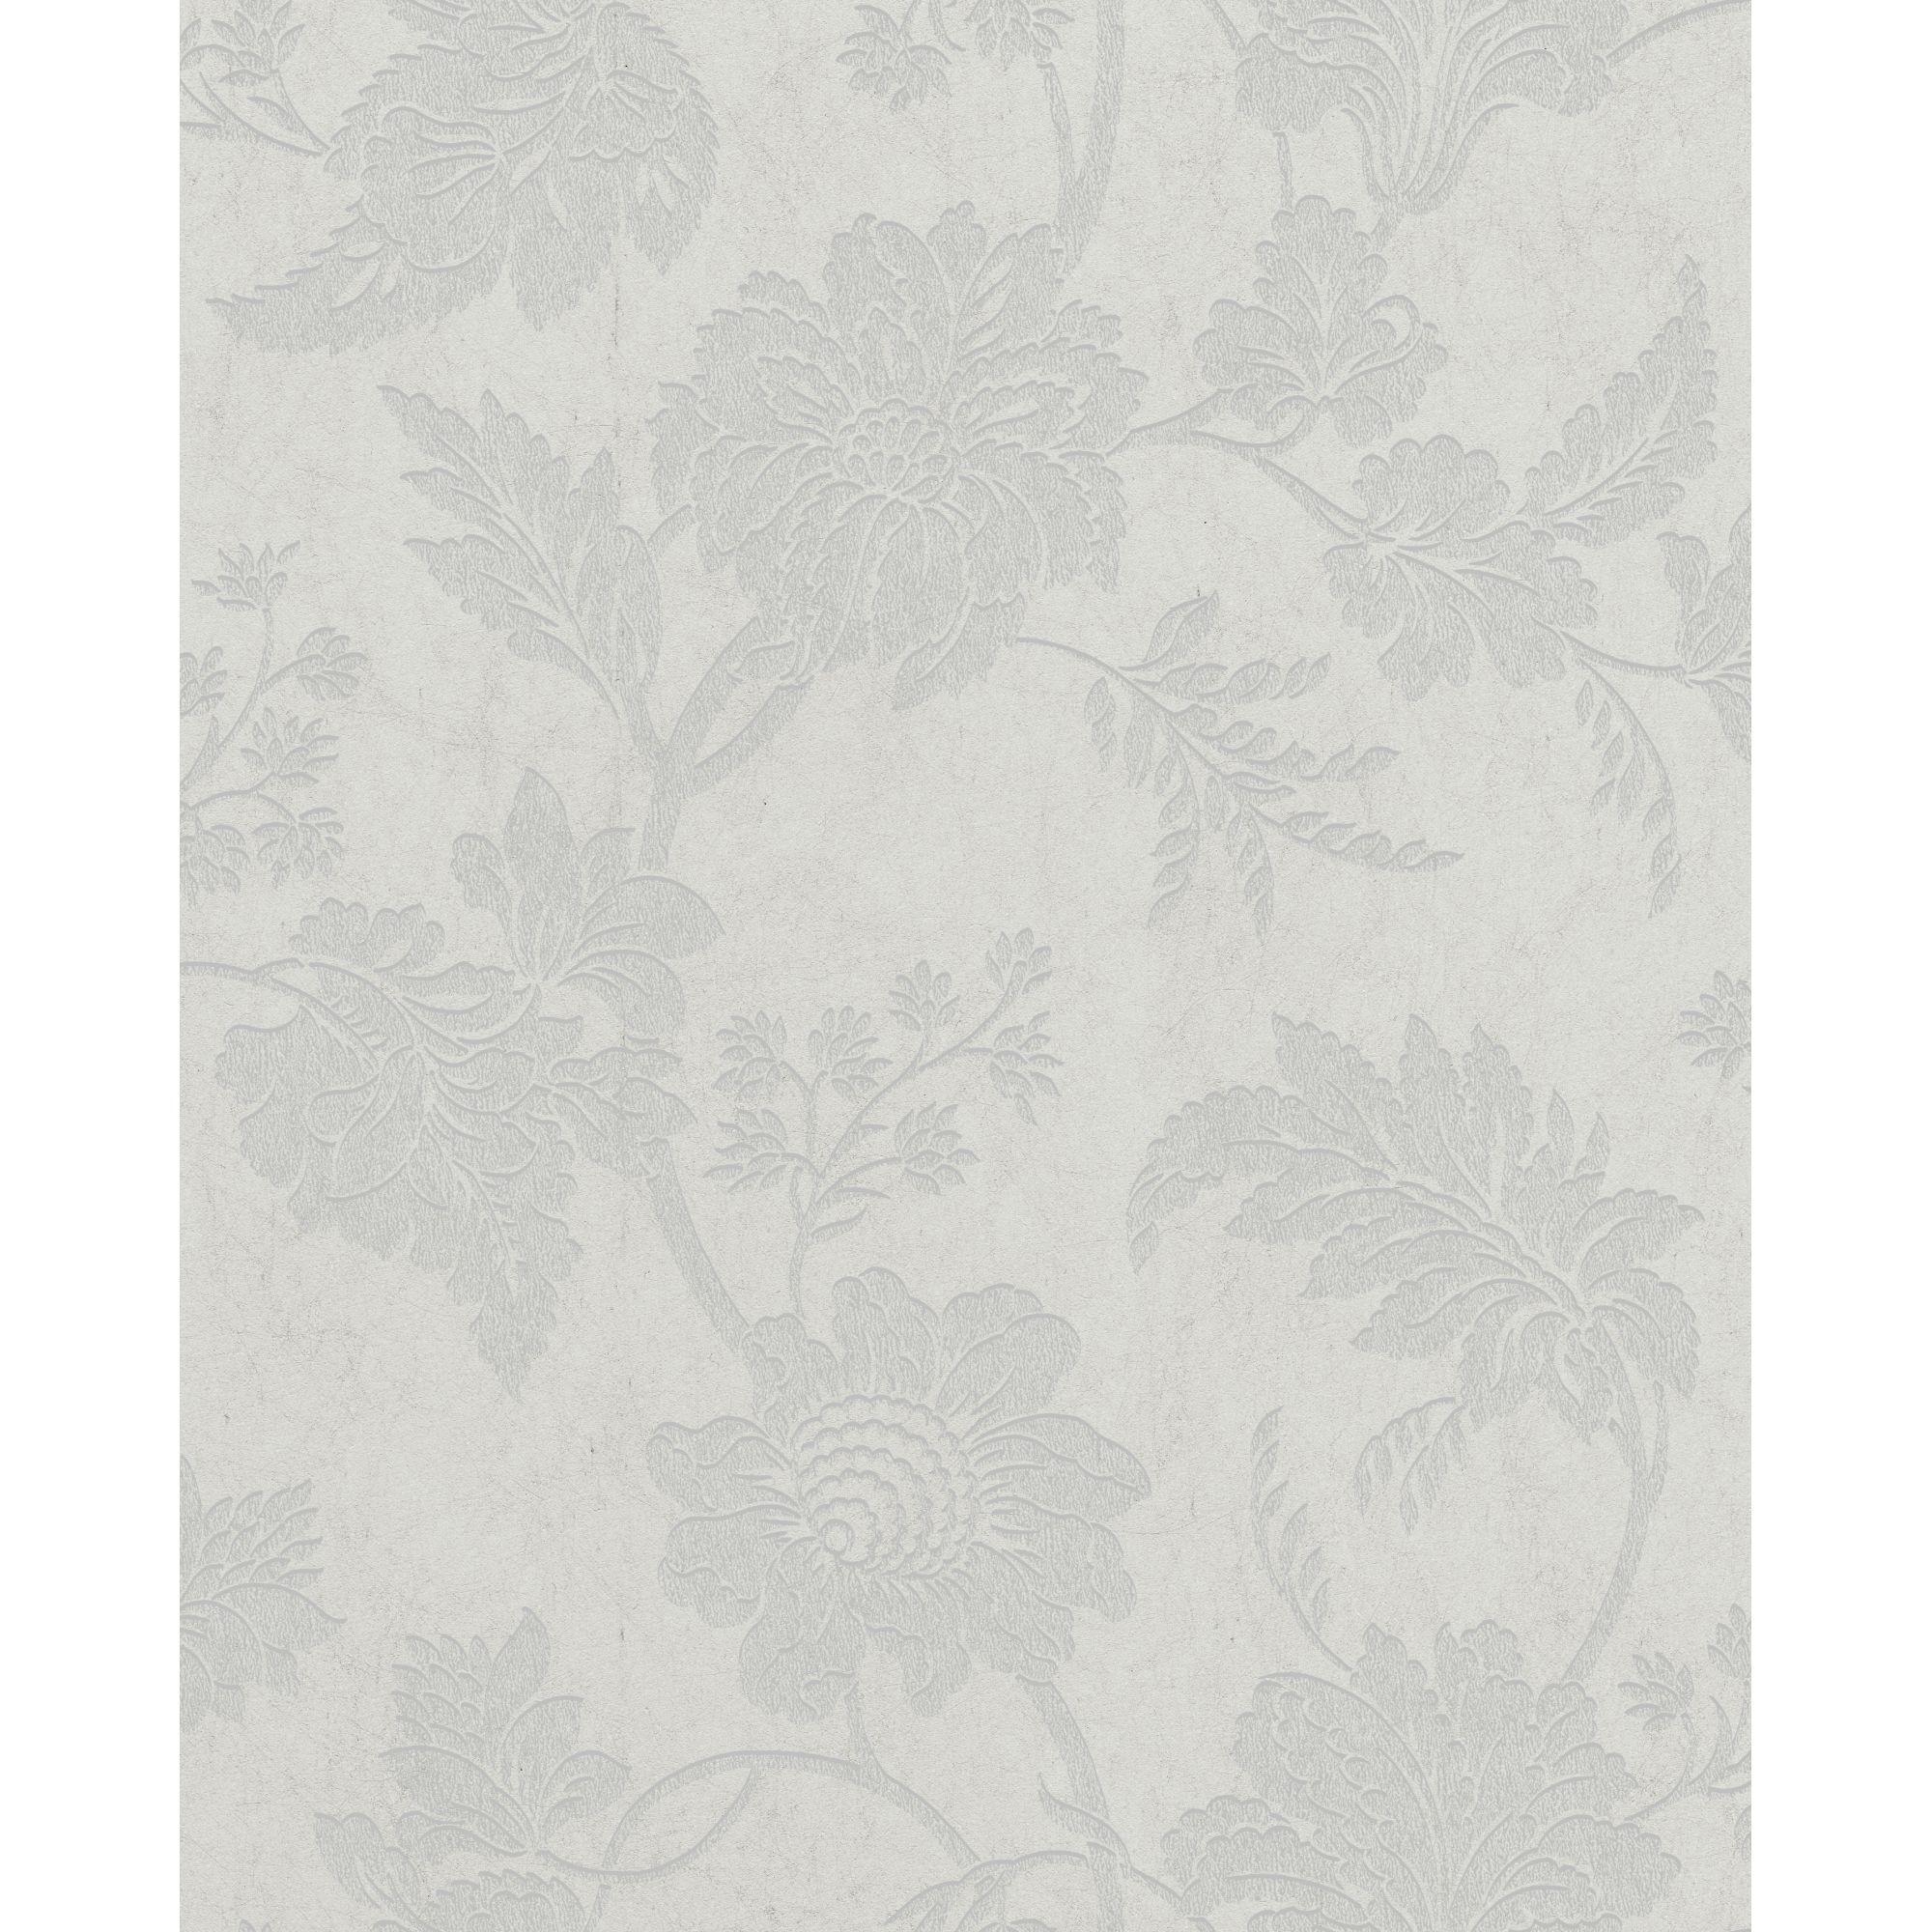 Mystique Dove Wallpaper GrahamBrownUK